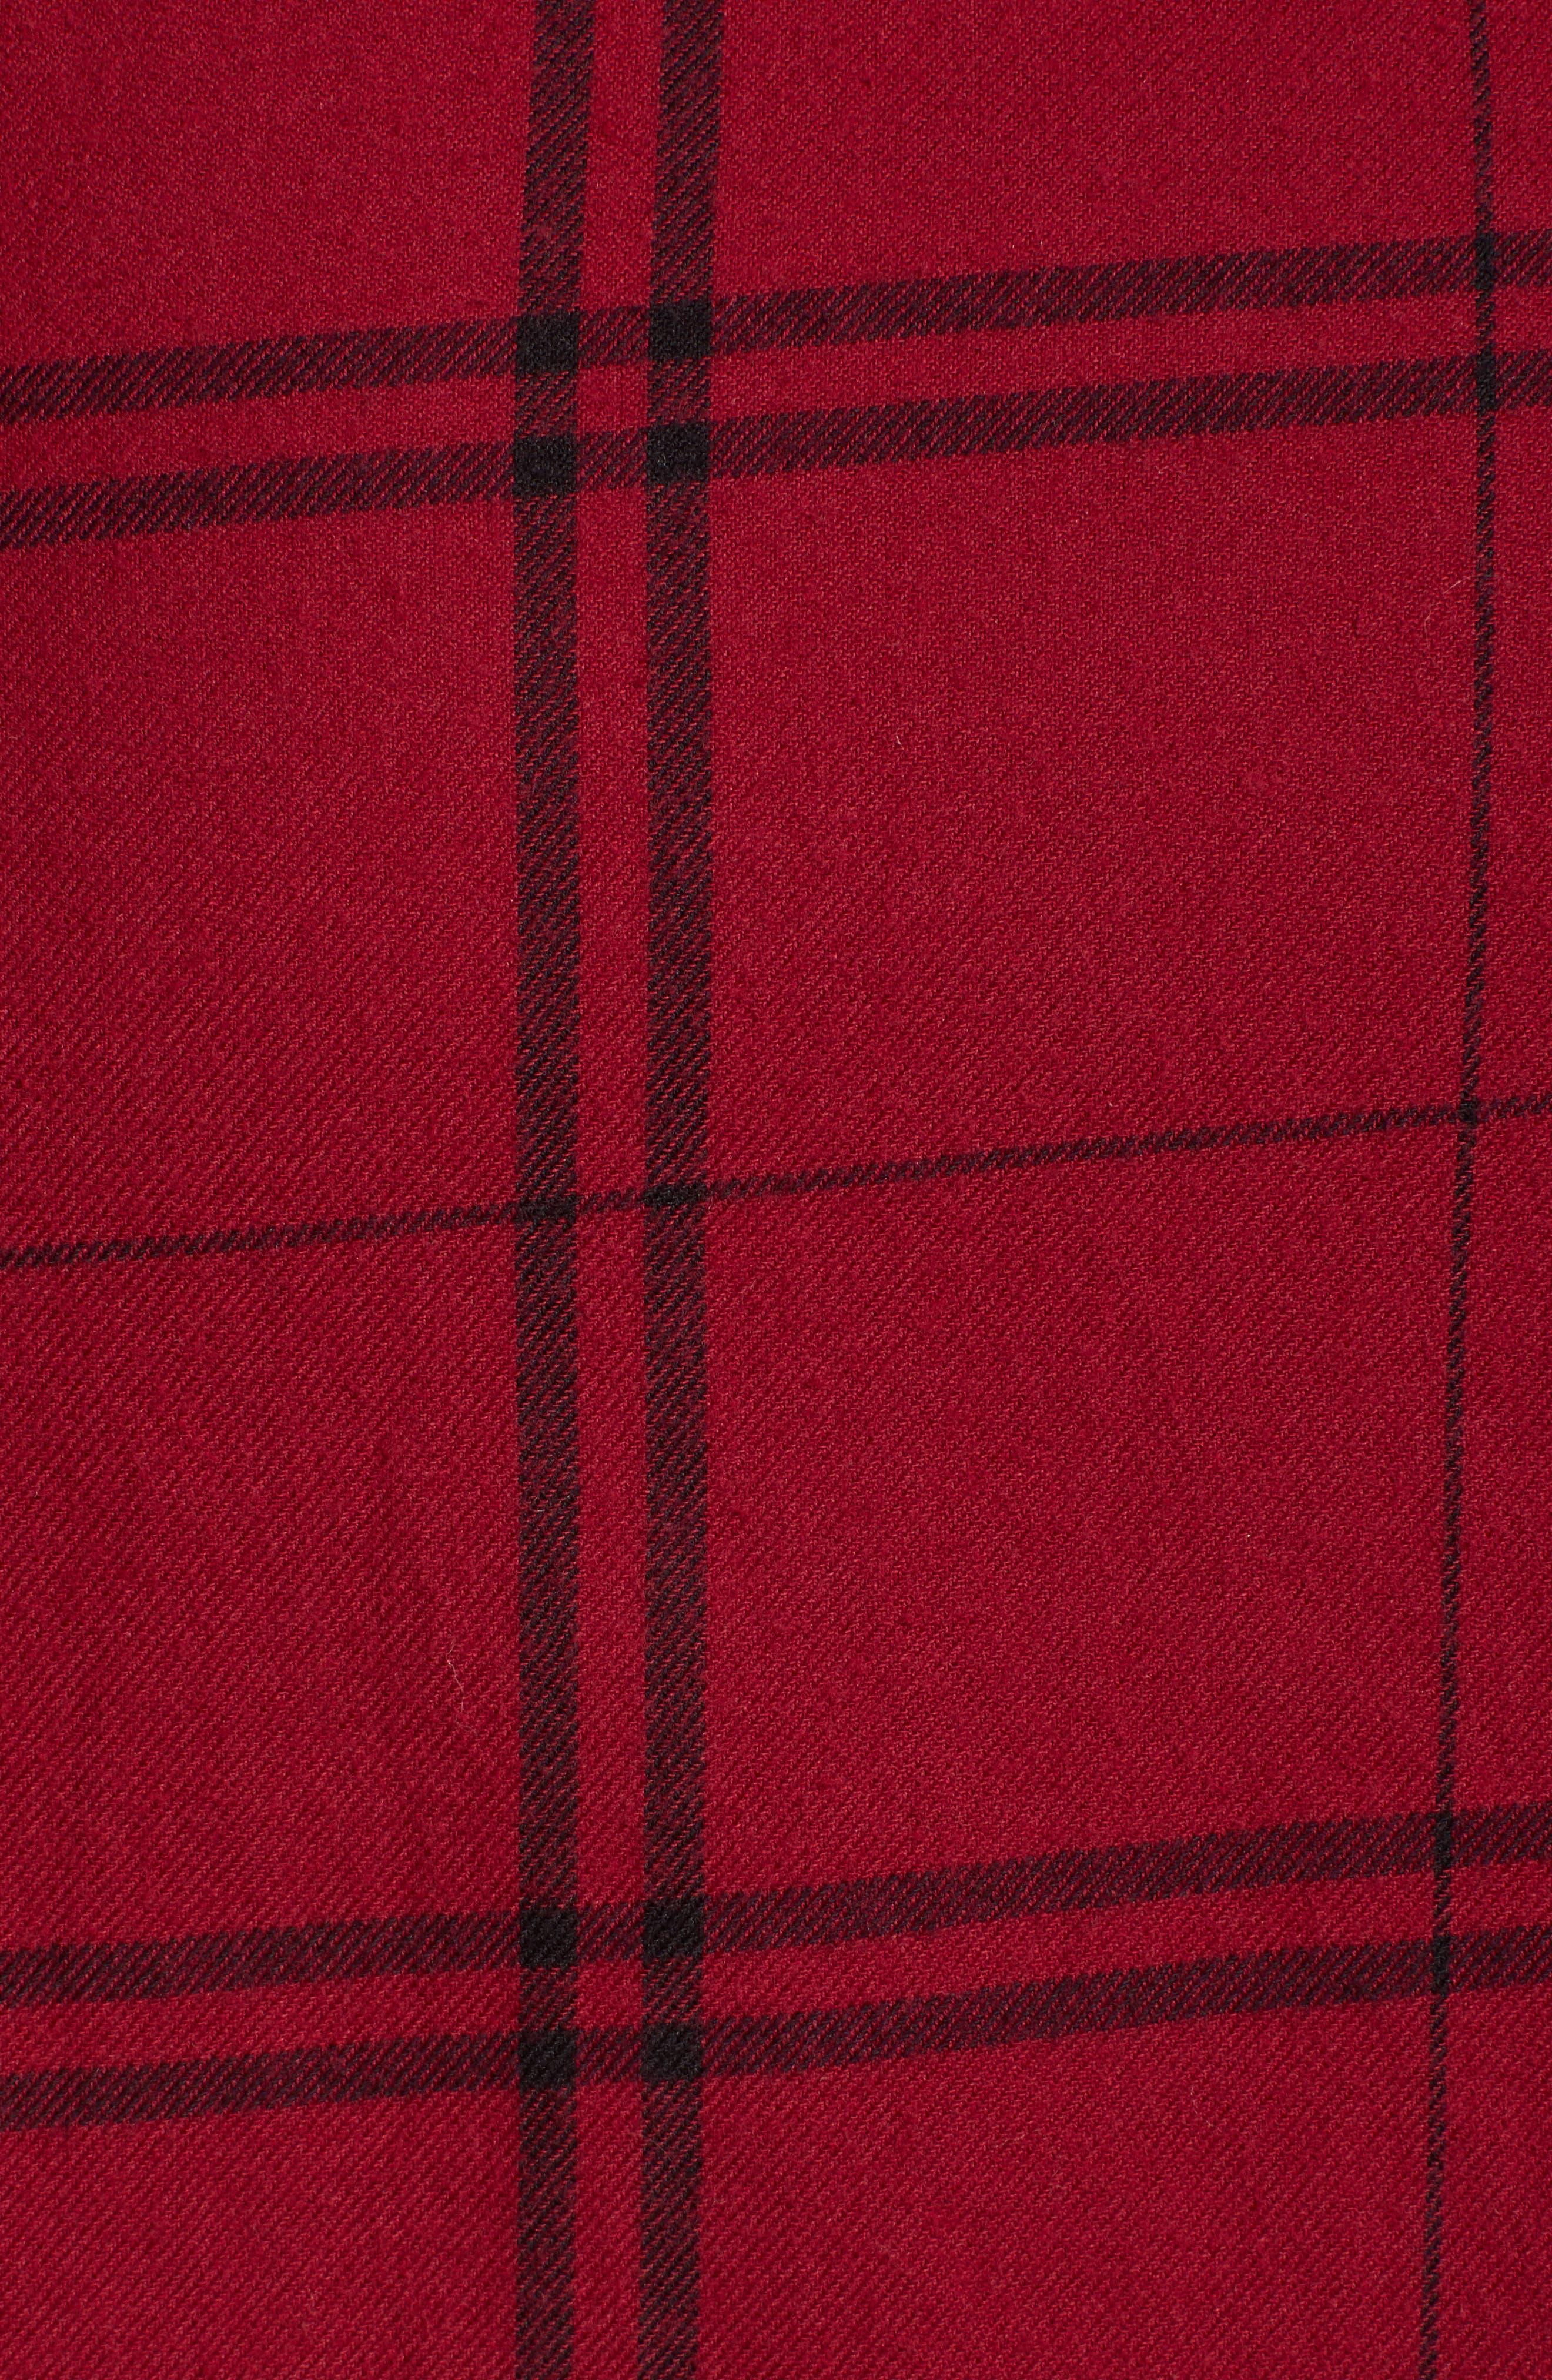 Plaid Shirt Dress,                             Alternate thumbnail 6, color,                             RED RUMBA SUNNY PLAID